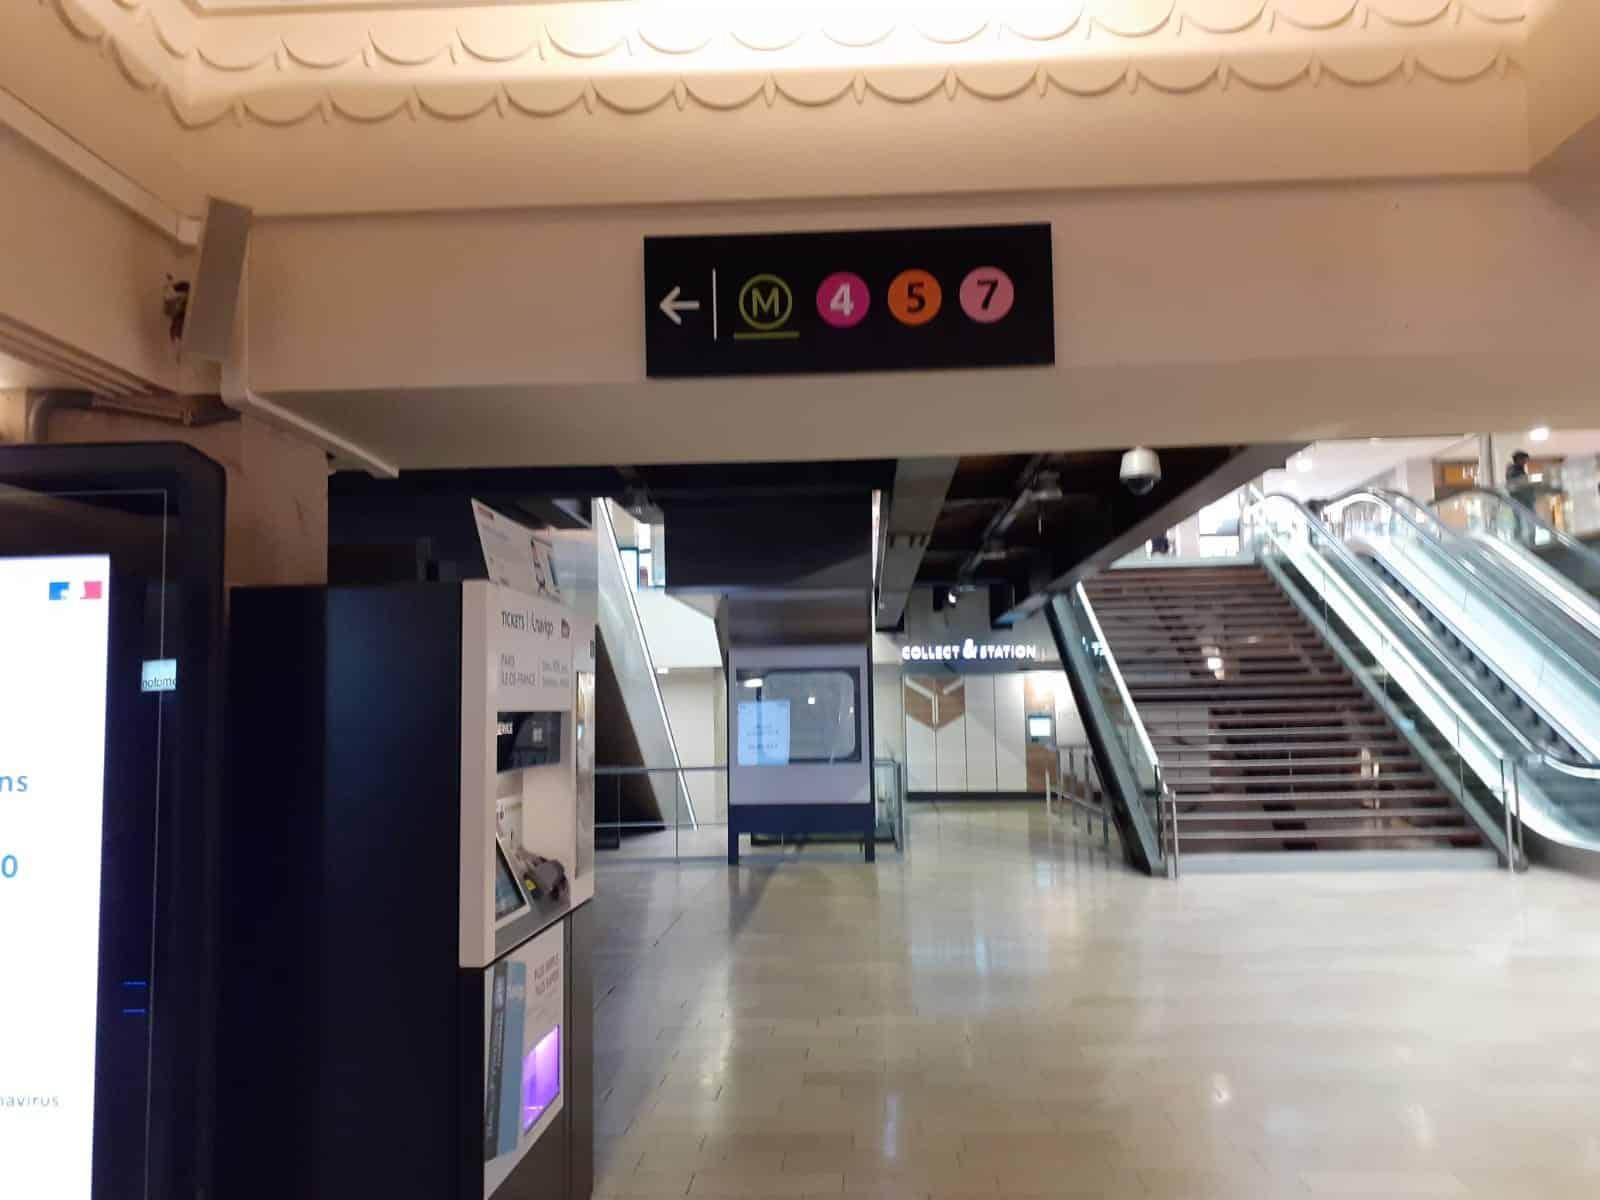 Paris Gare de l'Est Metro